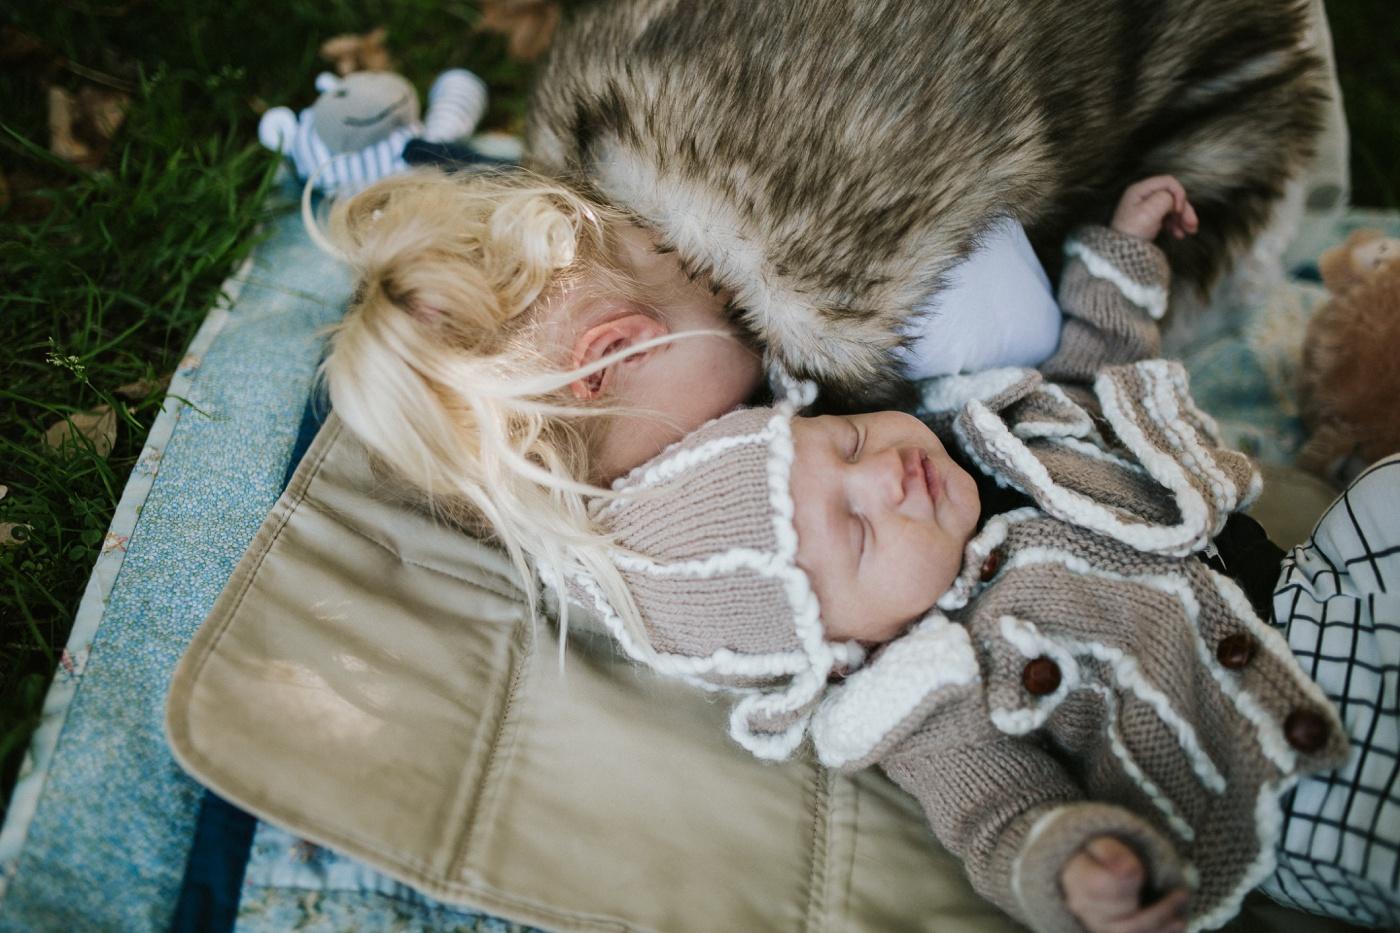 Blake-Lily-Rolig-Lekfull-Familjesession-Familjefotograf-Stockholm-Orebro_08